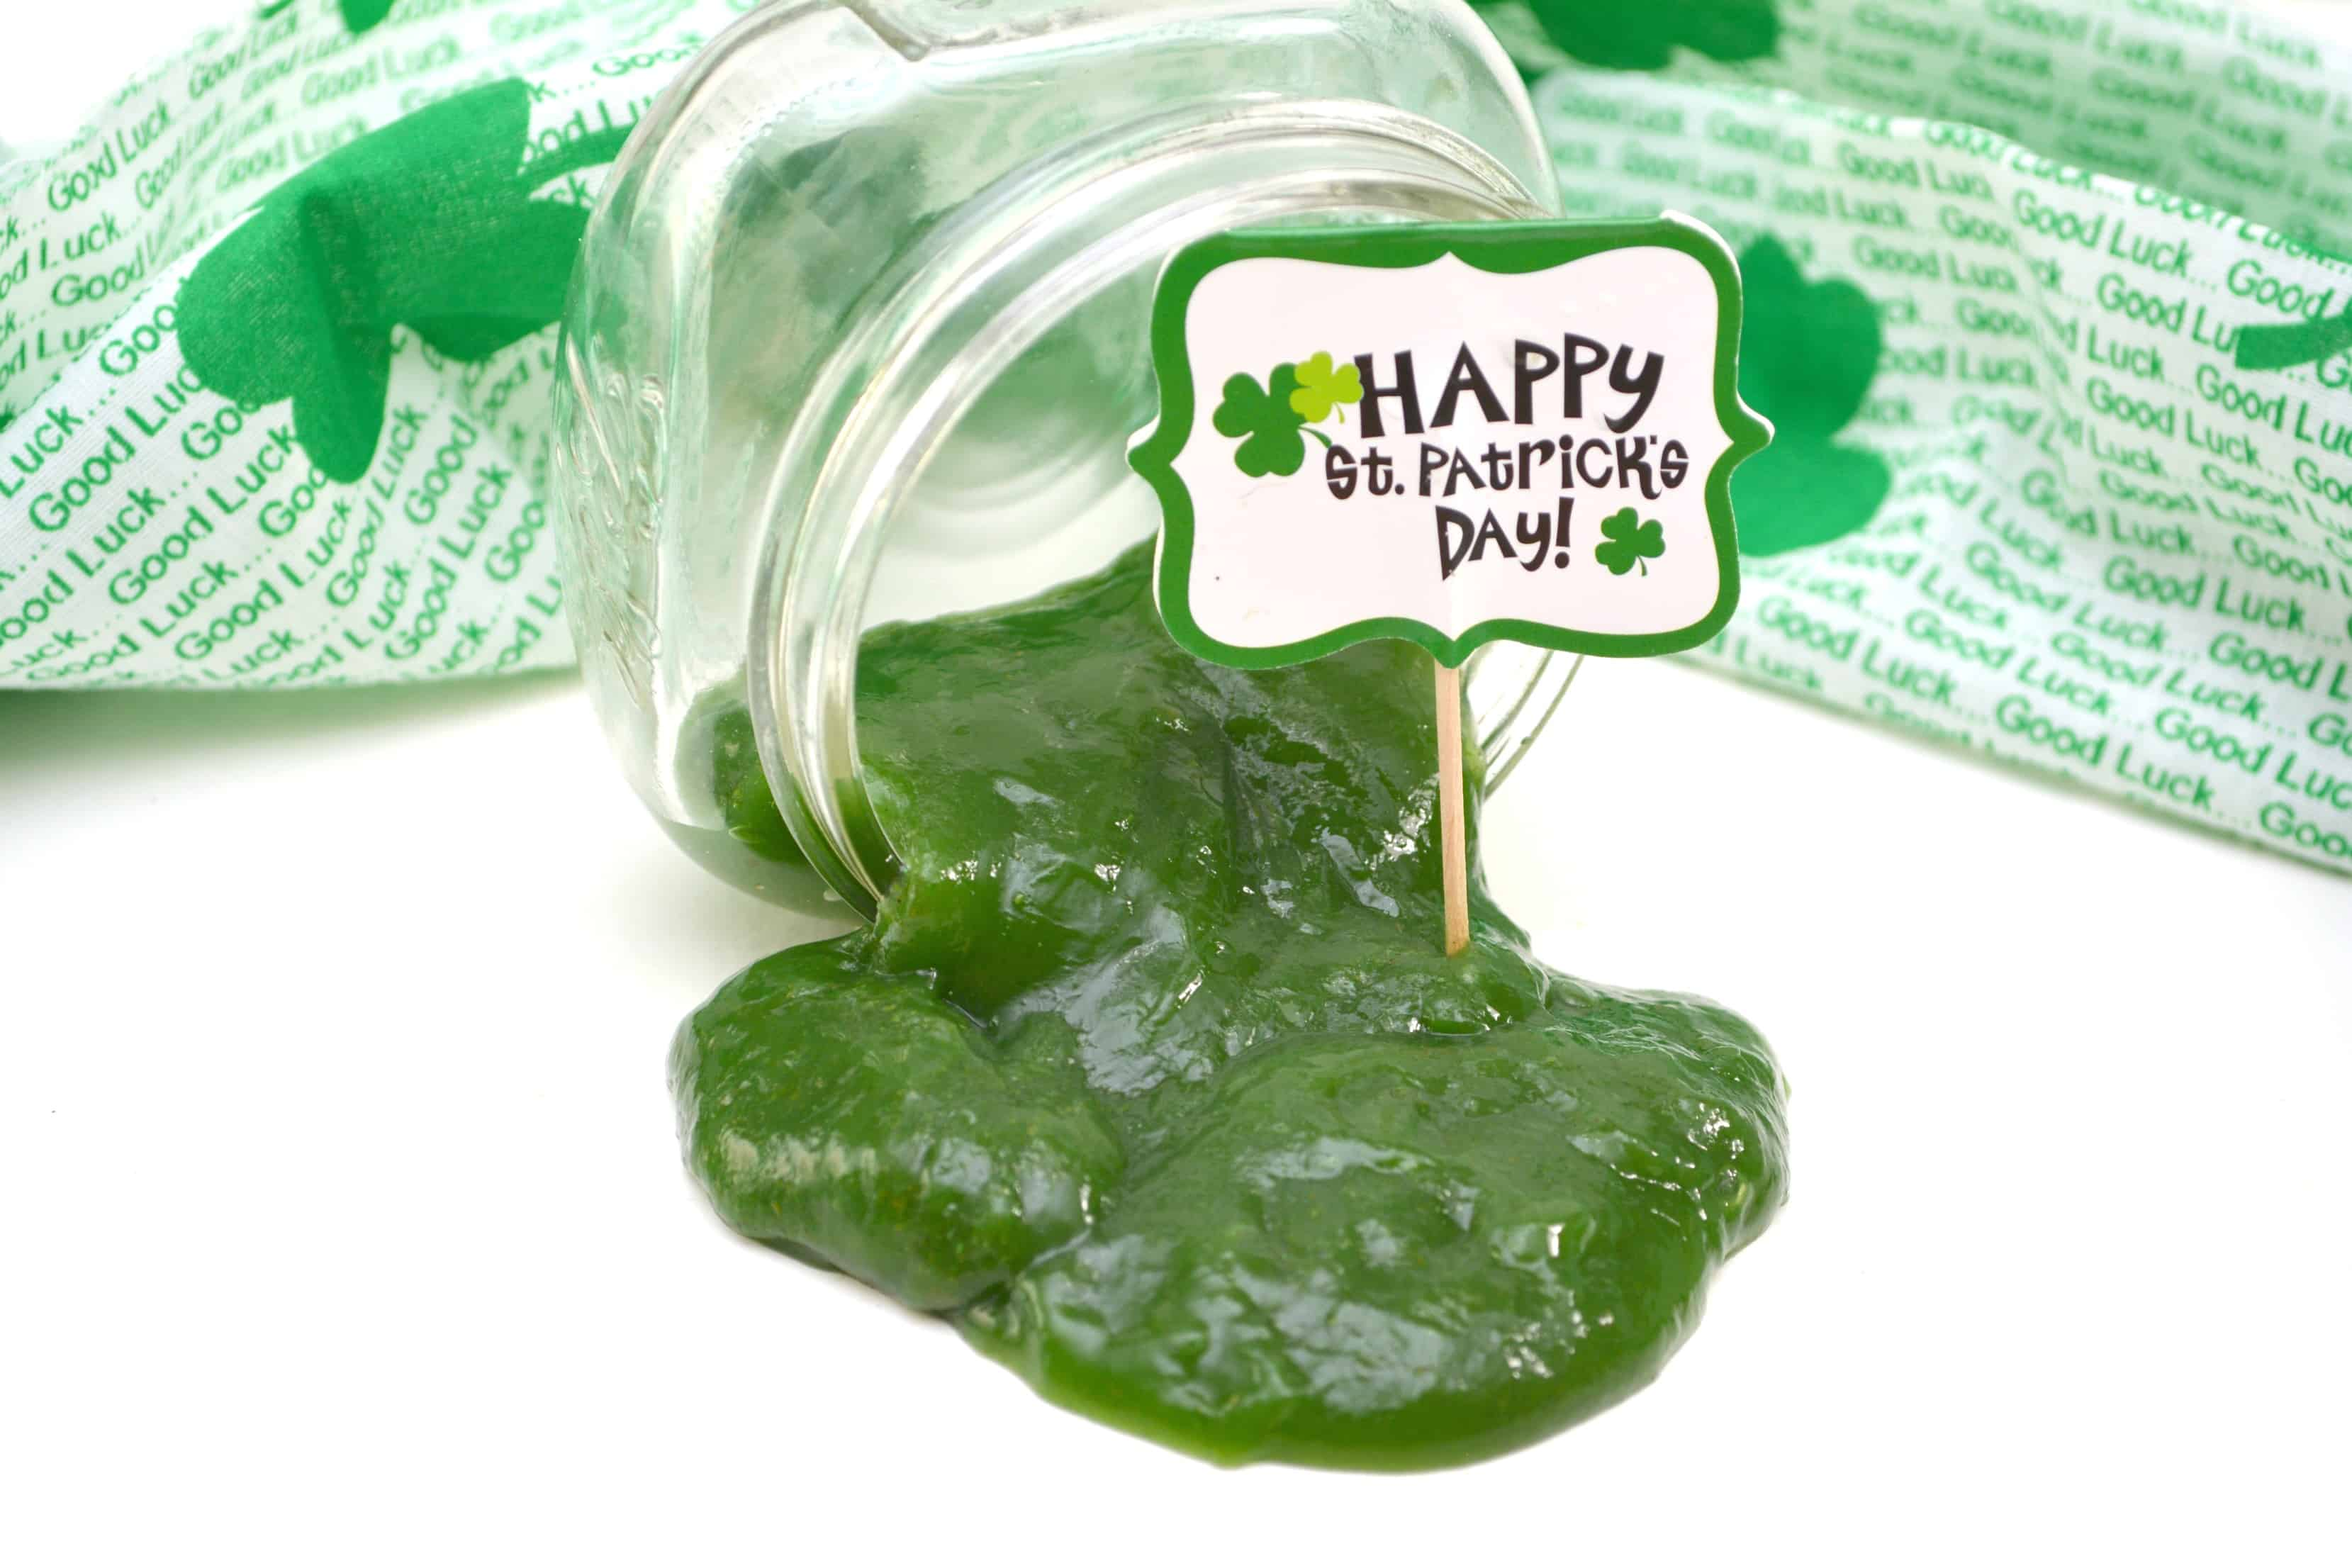 St. Patrick's Day Green Edible Slime Recipe